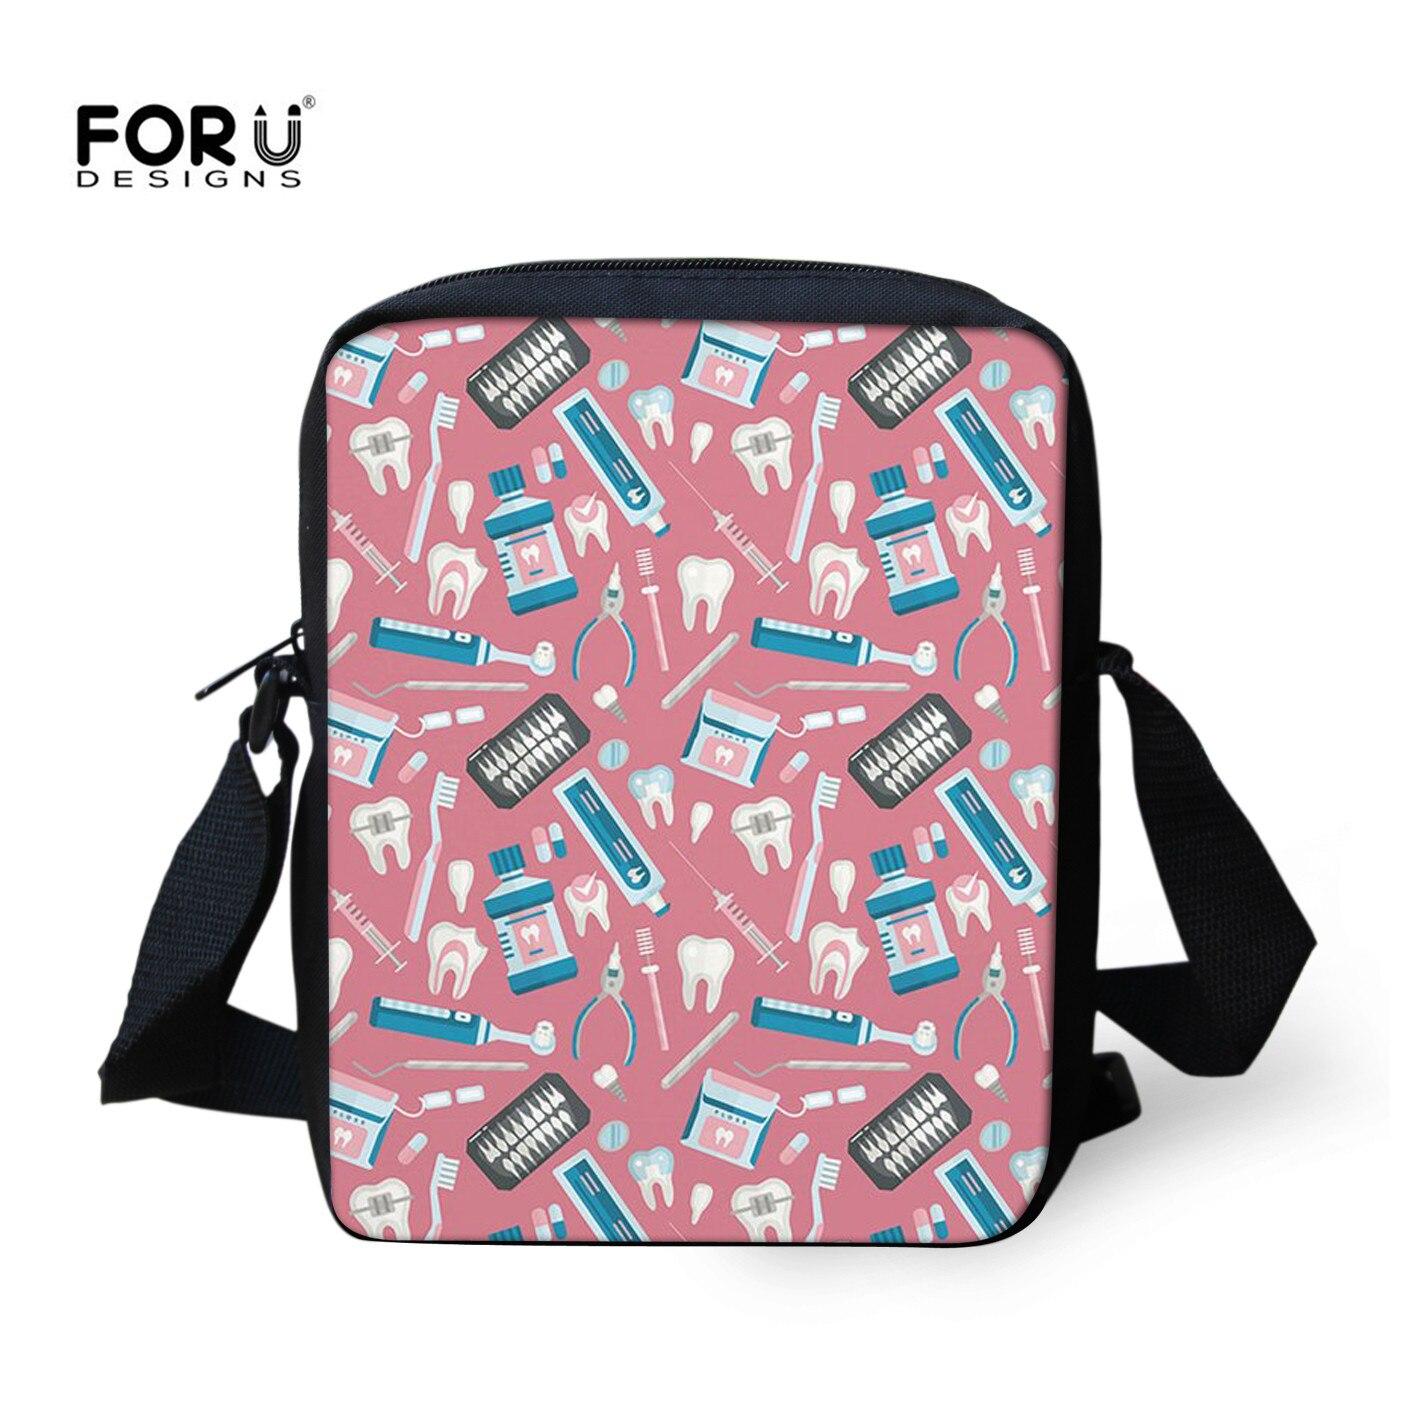 FORUDESIGNS Doctor Womens Handbag Pink Cartoon Printing Cross Body Bag For Kids Boys Girls Cute Travel Summer Children Handbag